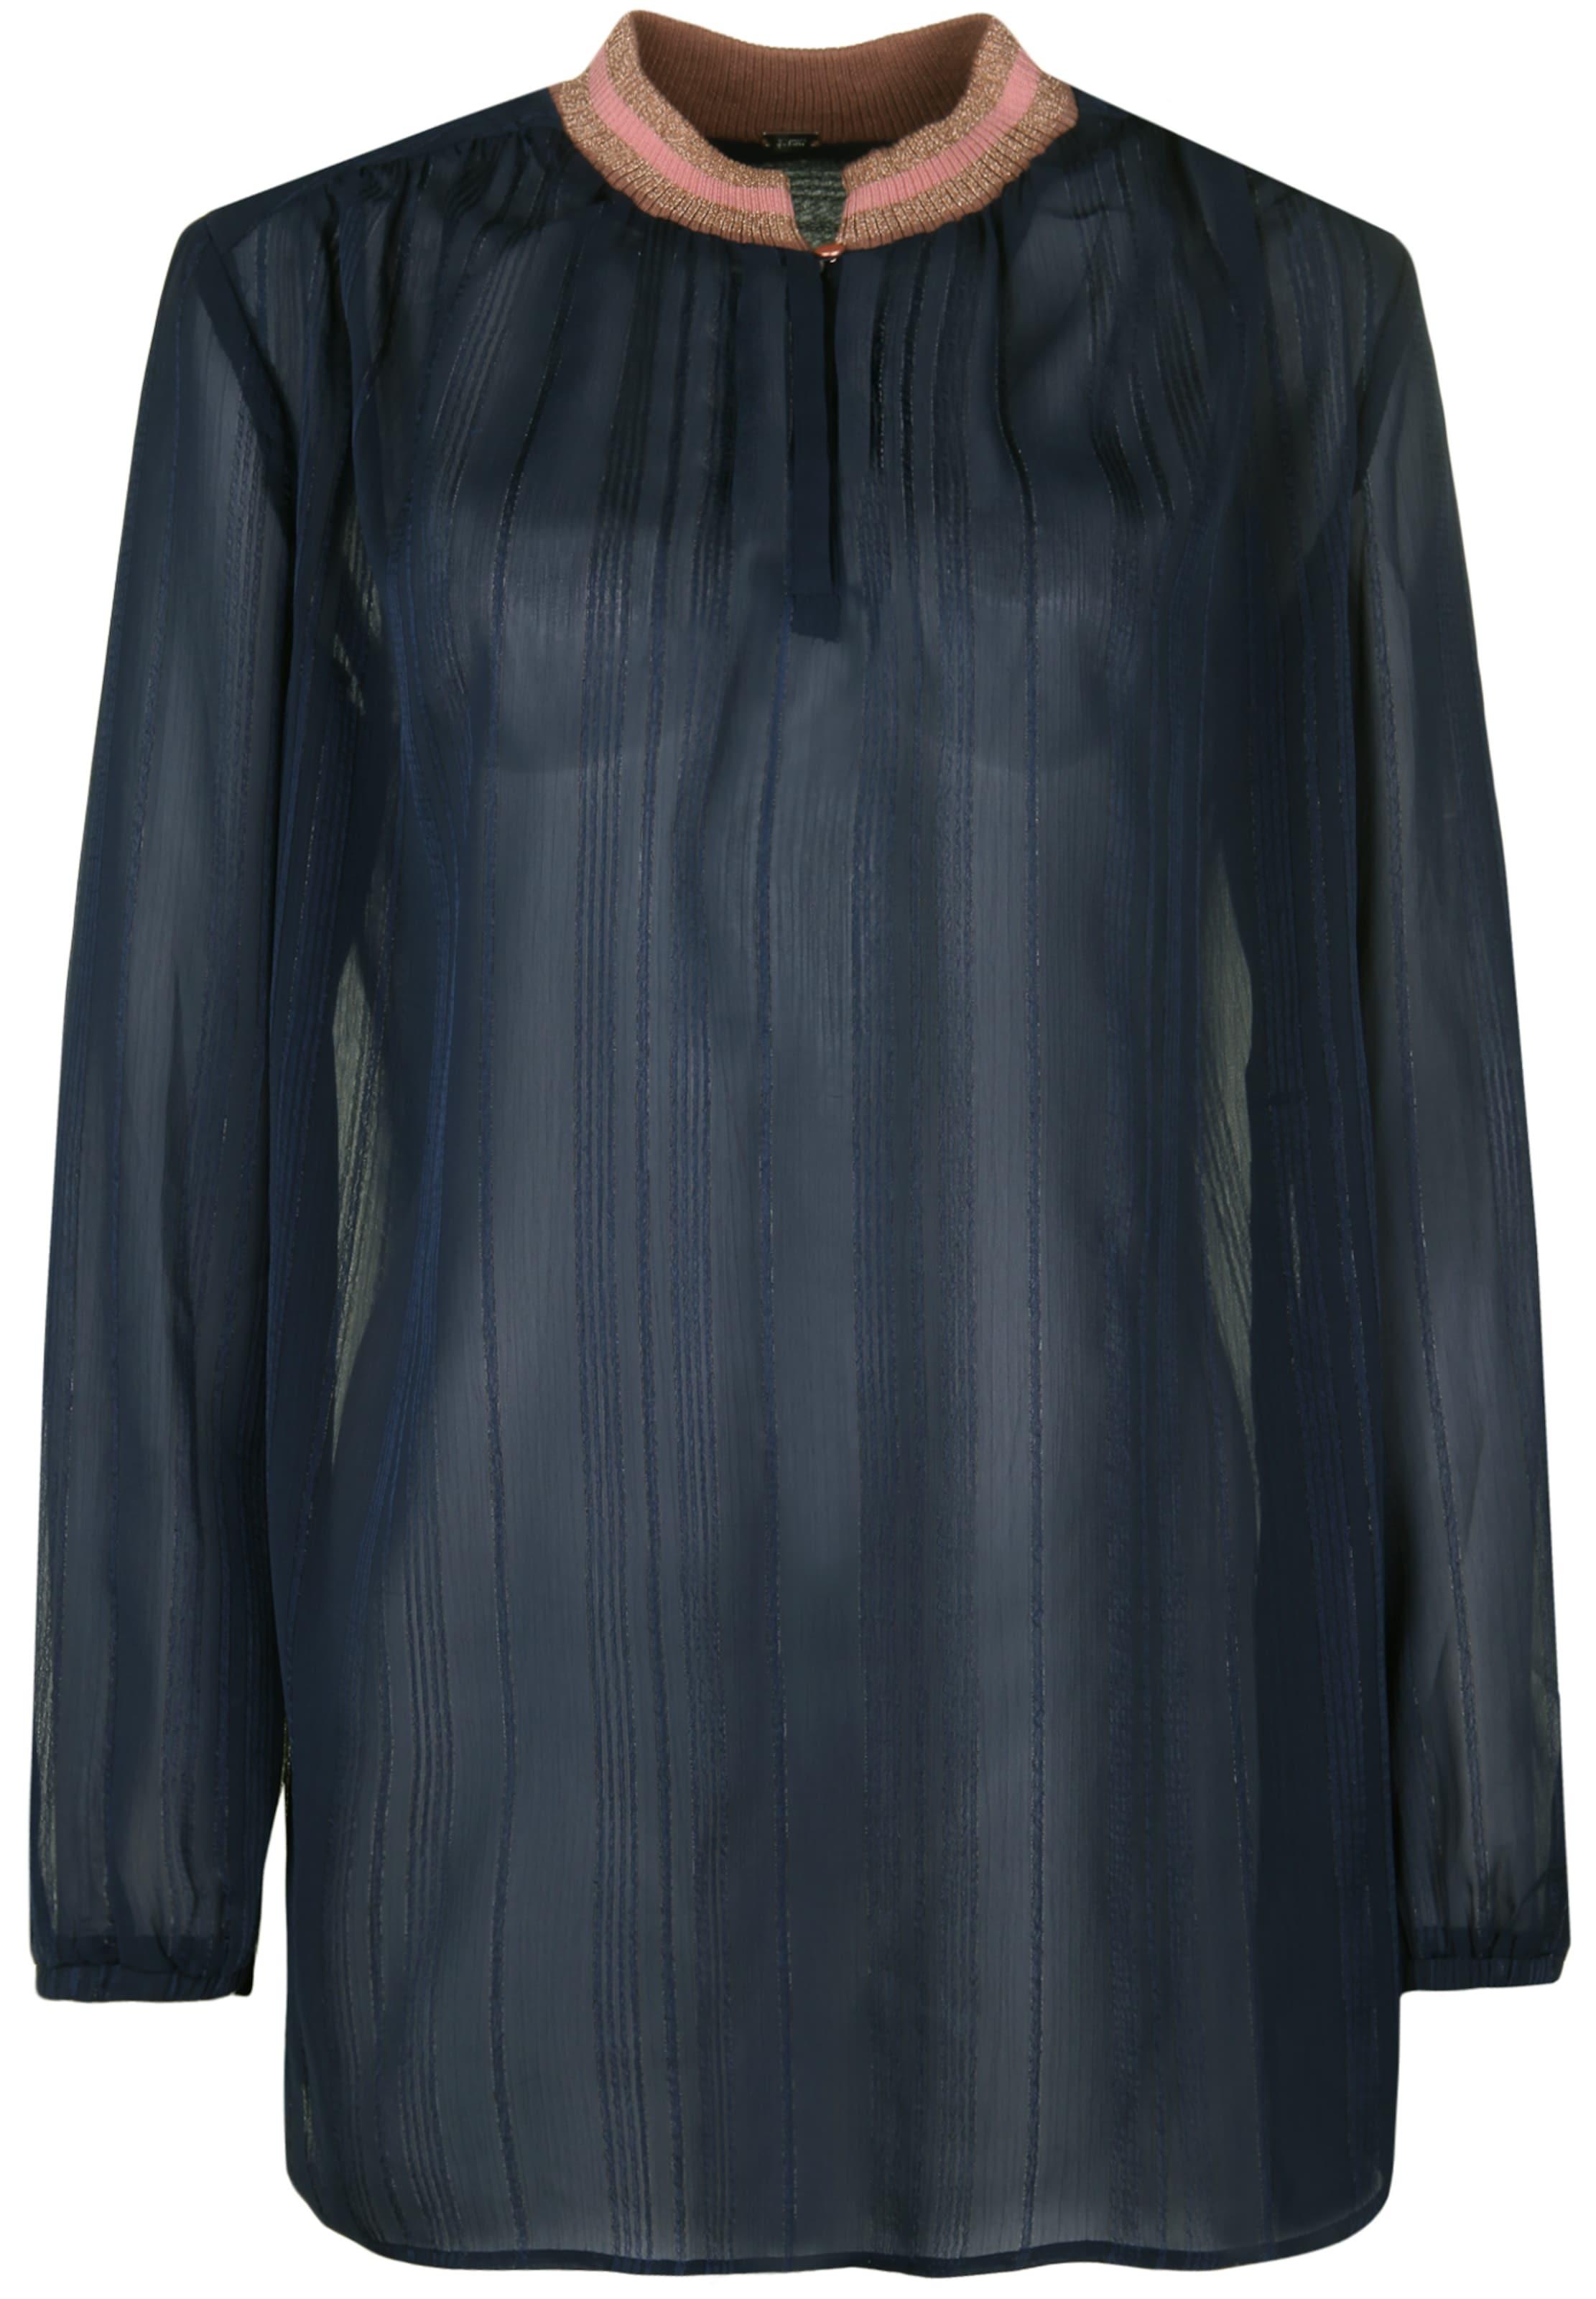 Bluse Glitzerdetails GUSTAV Bluse Glitzerdetails Bluse mit GUSTAV 'PLEATED' Bluse GUSTAV Glitzerdetails GUSTAV 'PLEATED' mit mit 'PLEATED' EPqSWAq